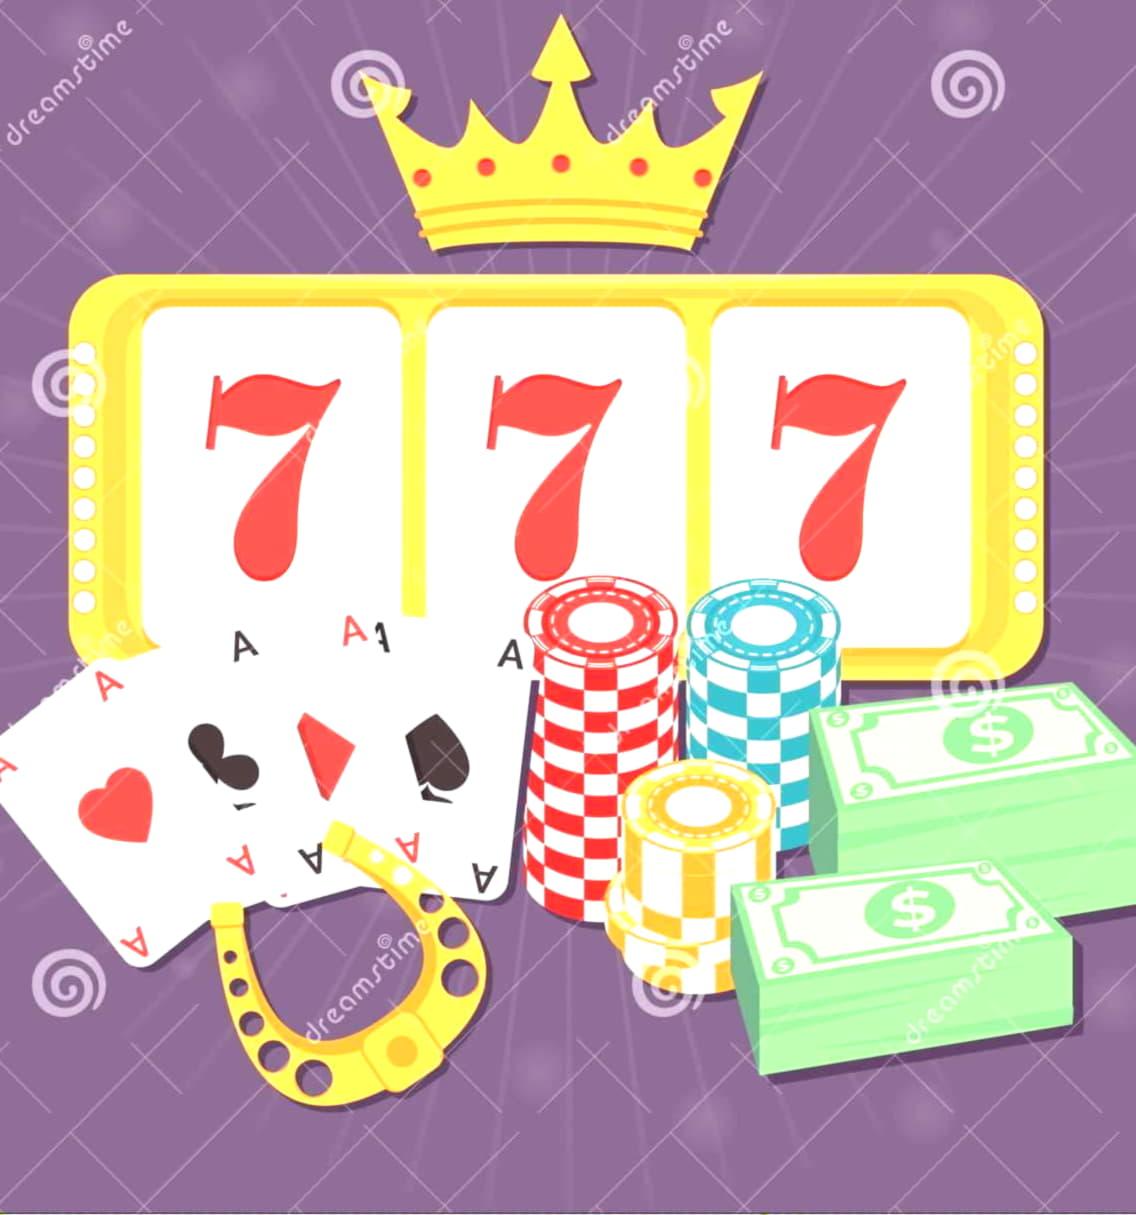 $135 Casino Tournament at LV Bet Casino